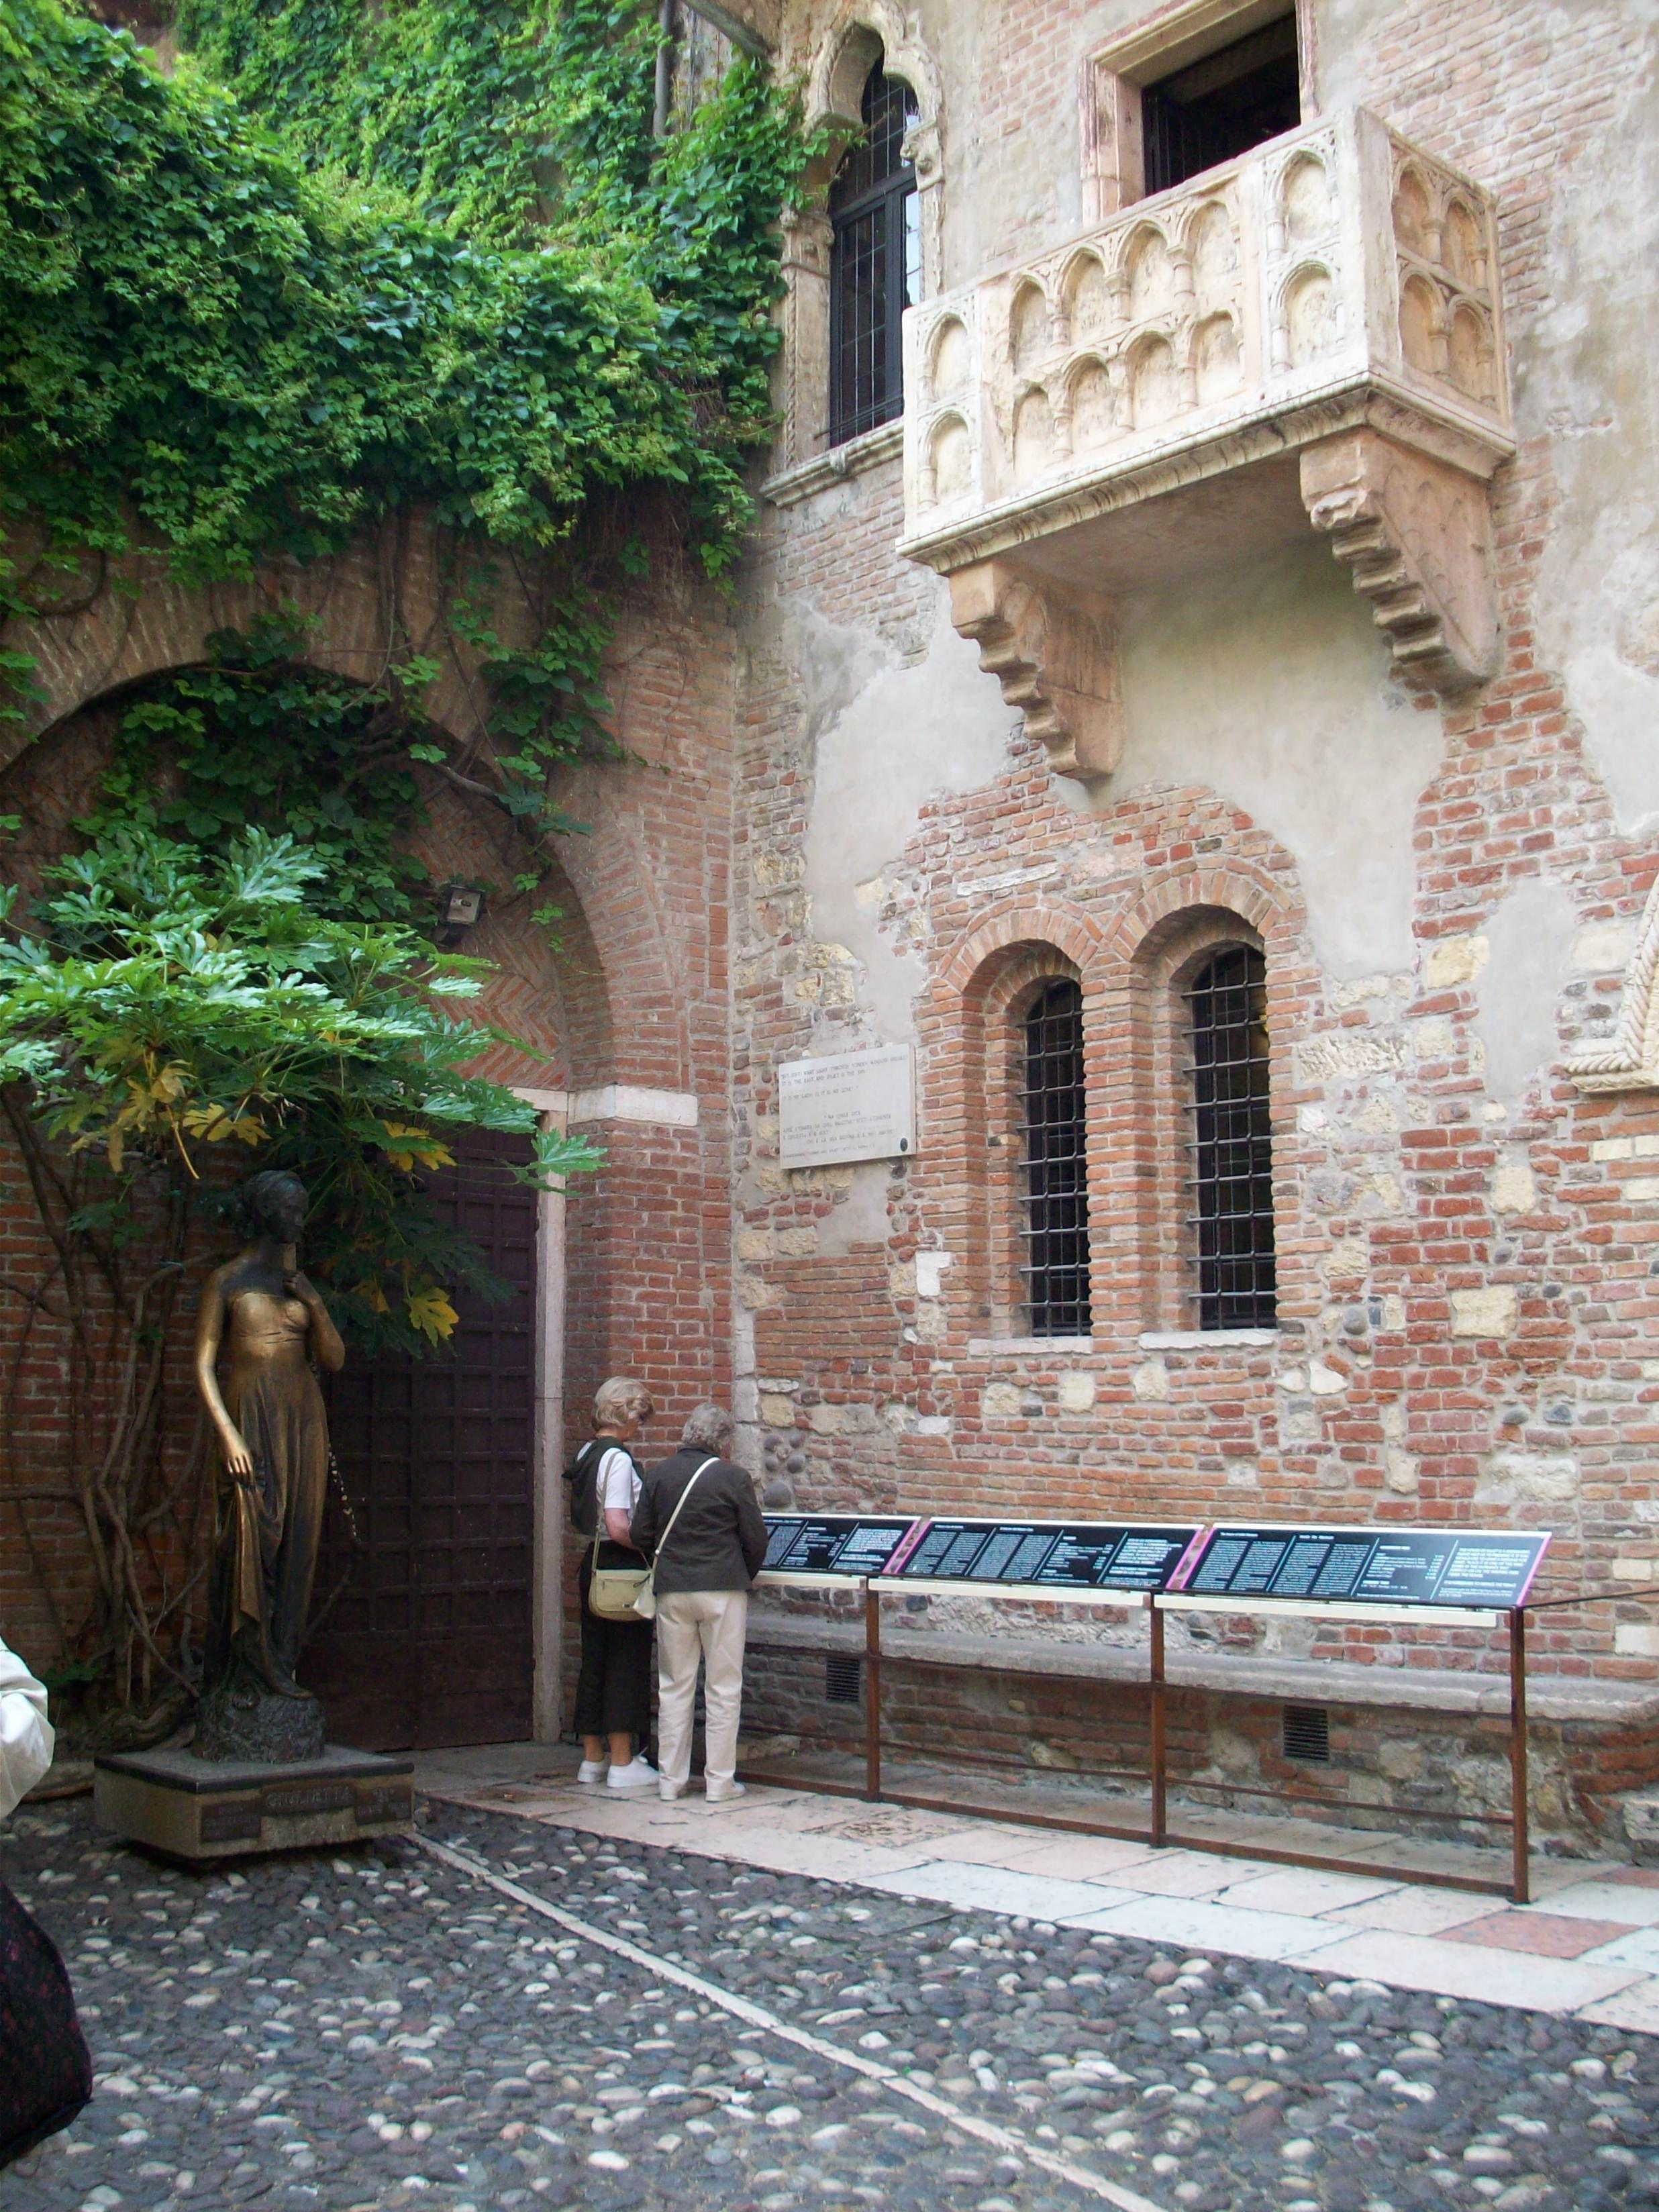 Verona Italy Juliett S Balcony To Bad There Were No Letters